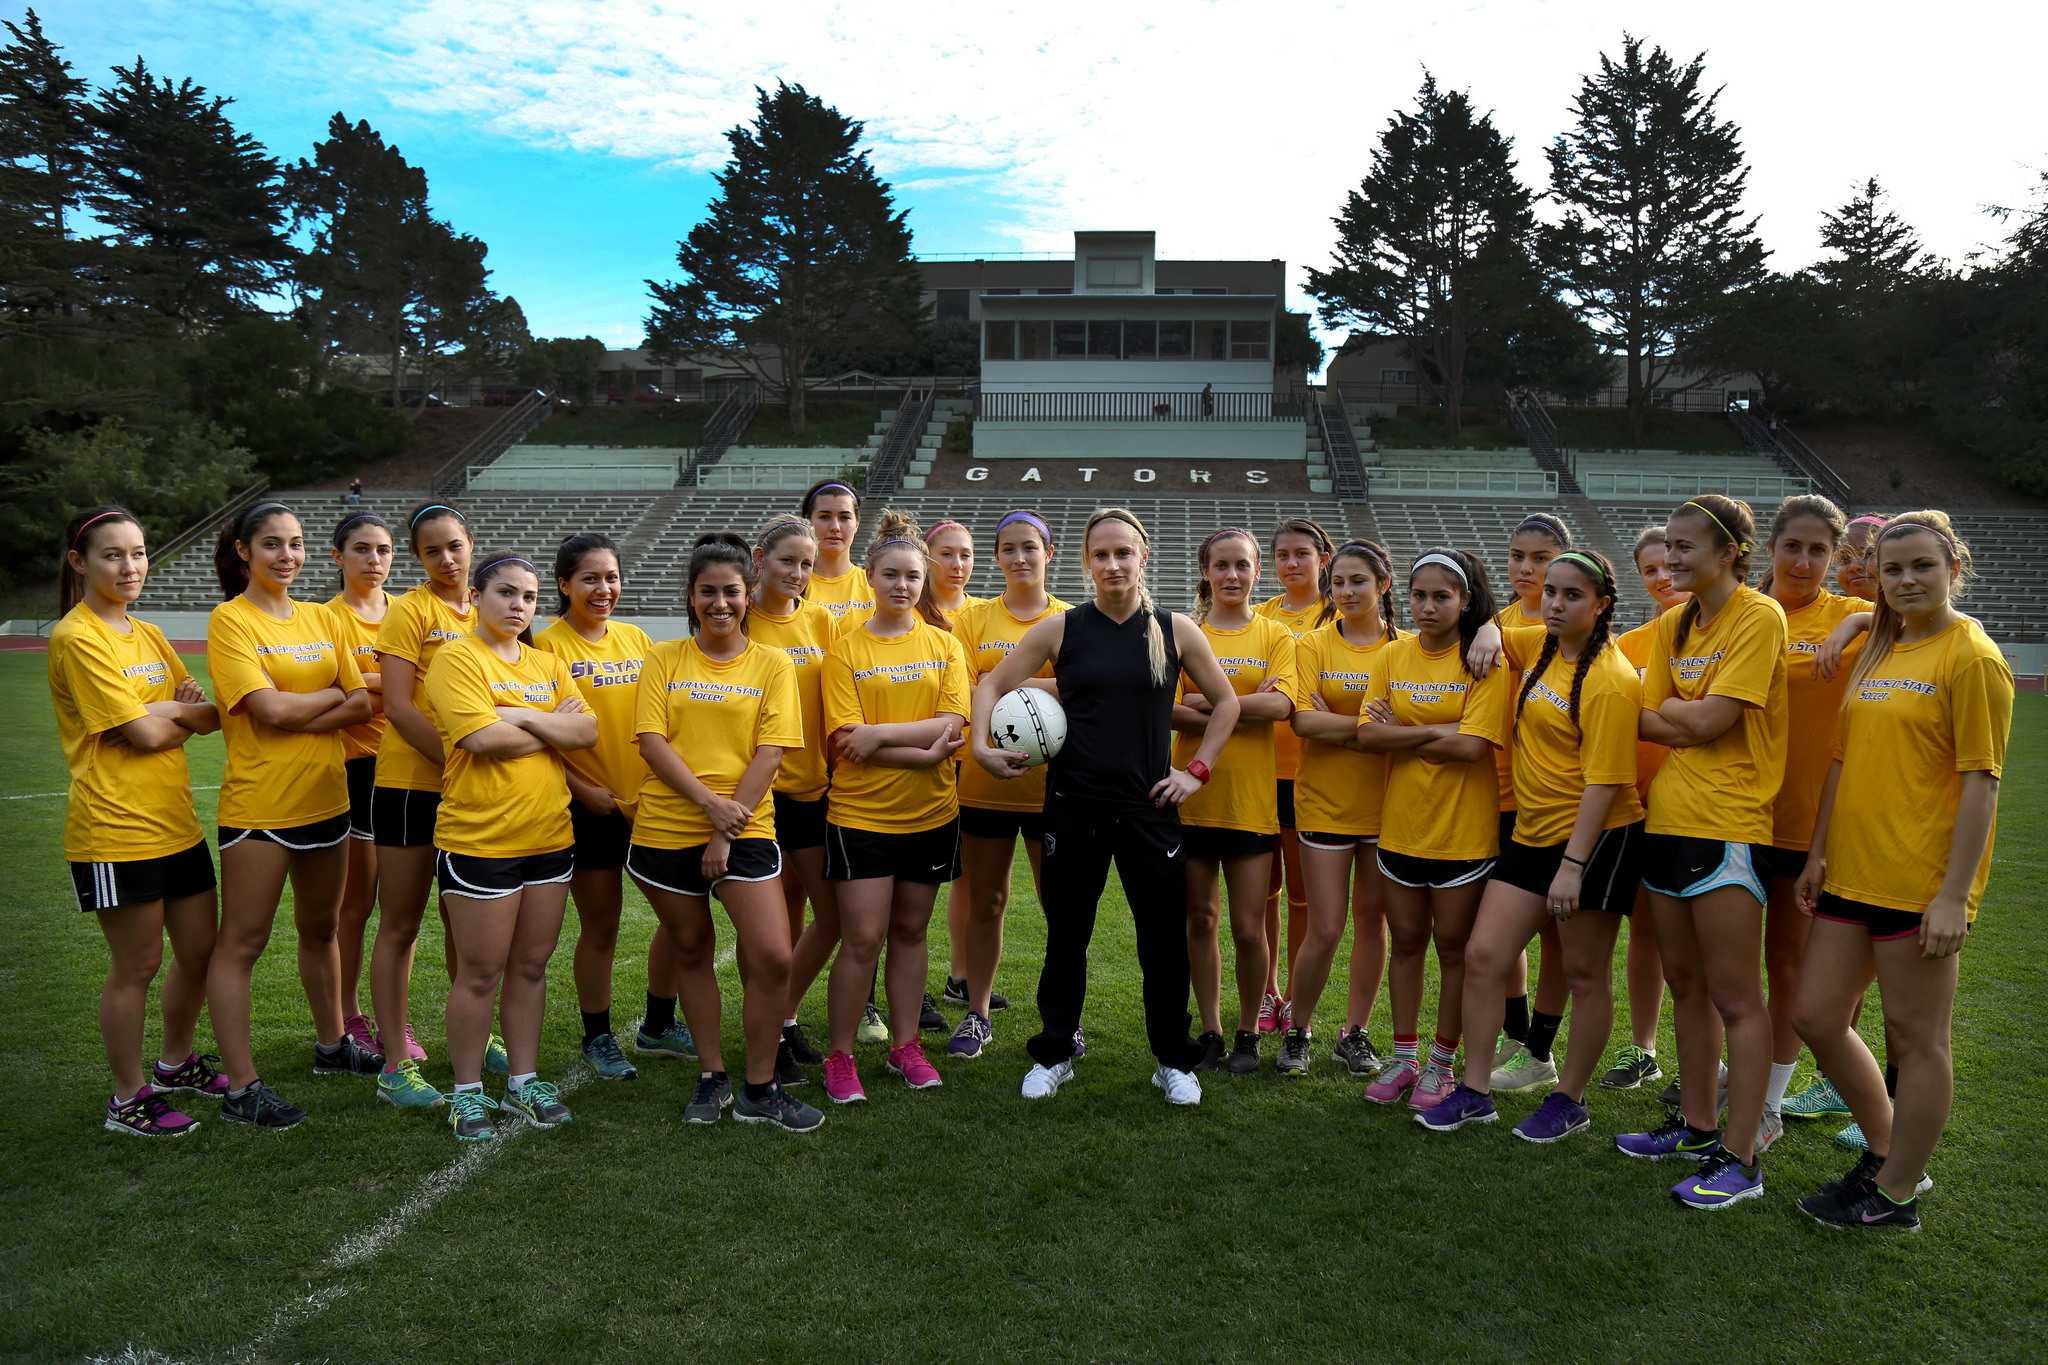 Women's soccer coach joins UC Davis as new head coach